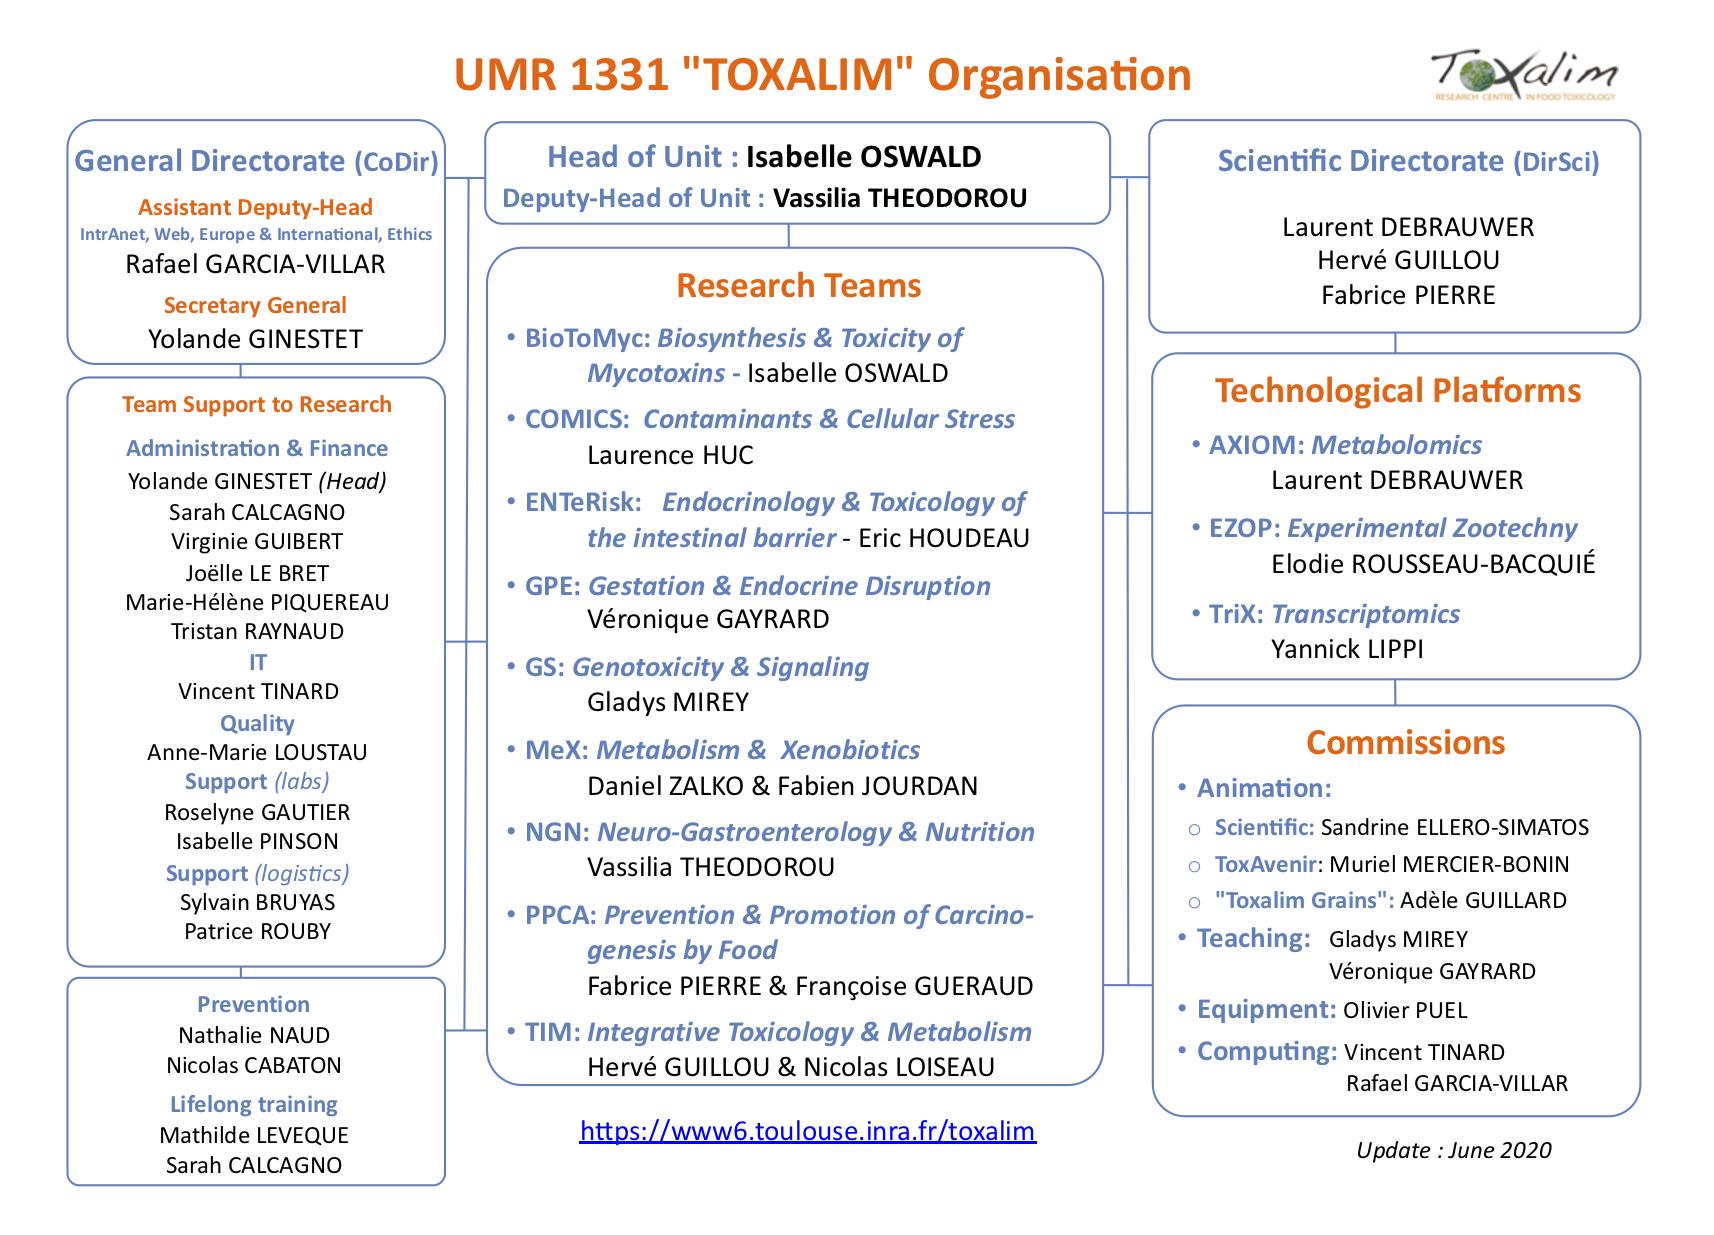 toxalim organisation flowchart_V16_202006